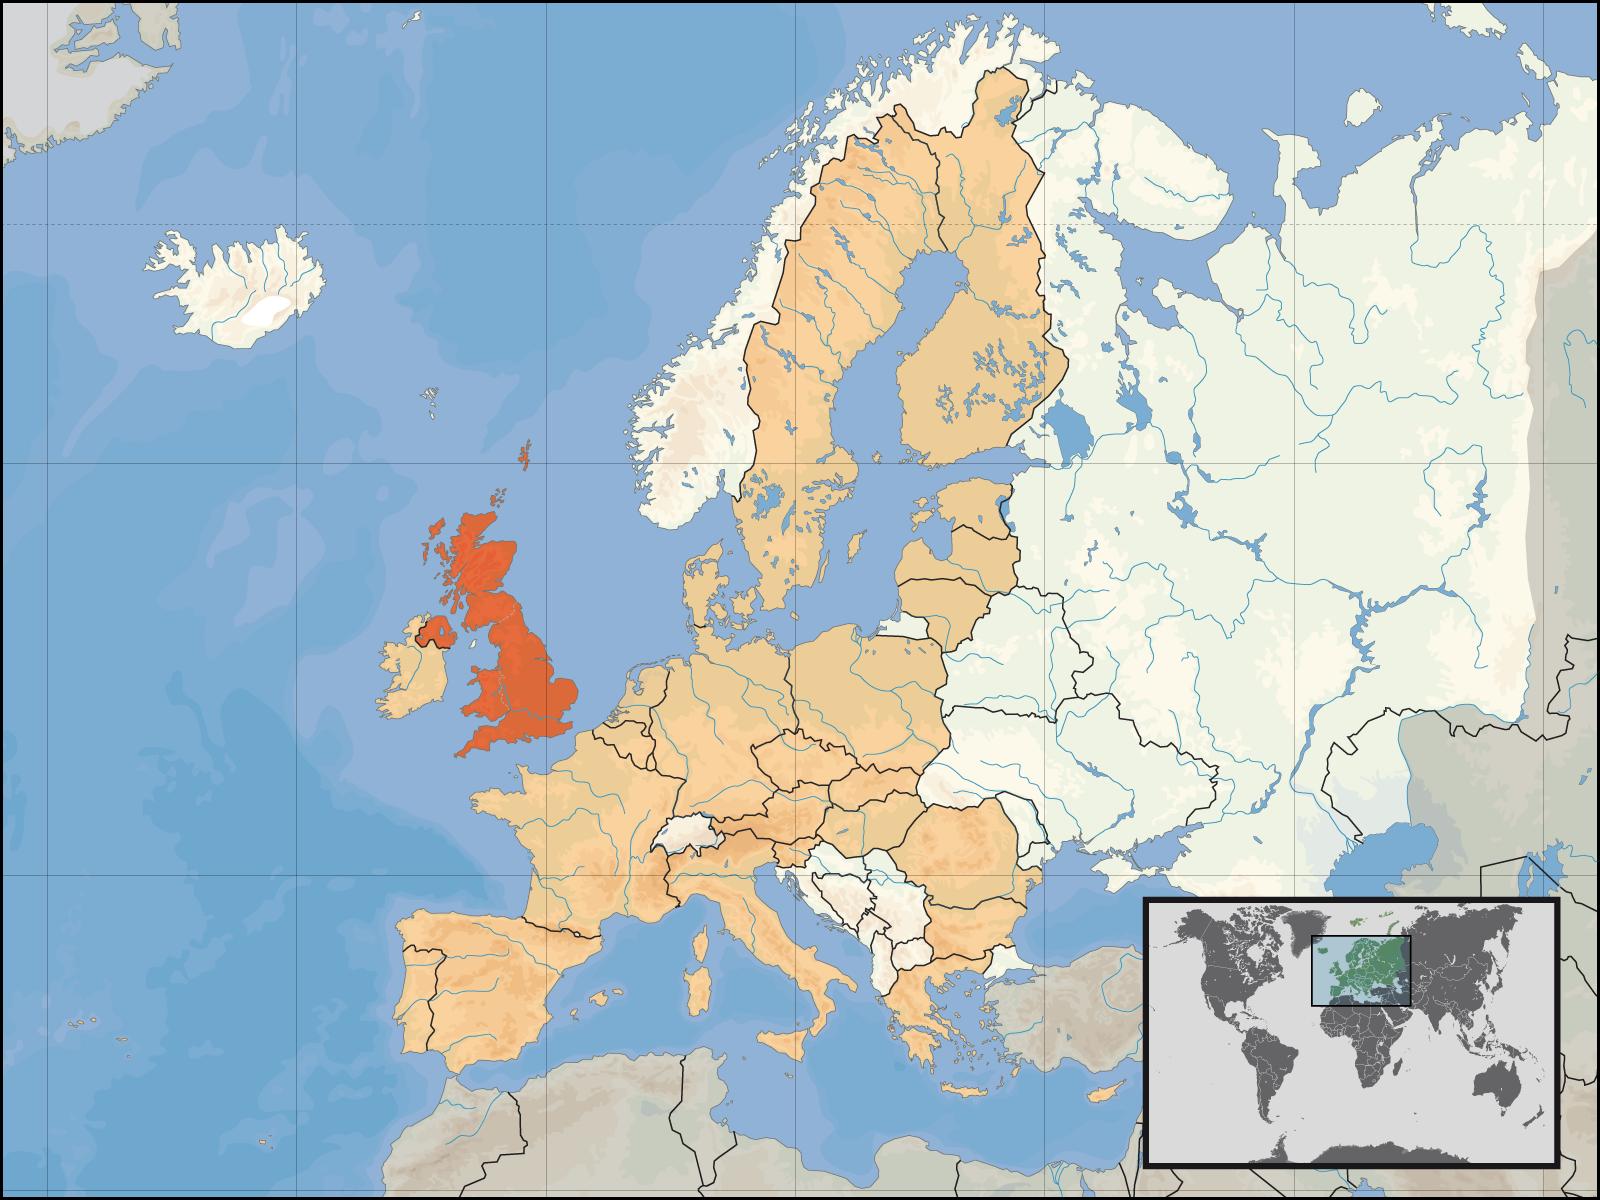 Atlas Map Of England.Atlas Of The United Kingdom Wikimedia Commons